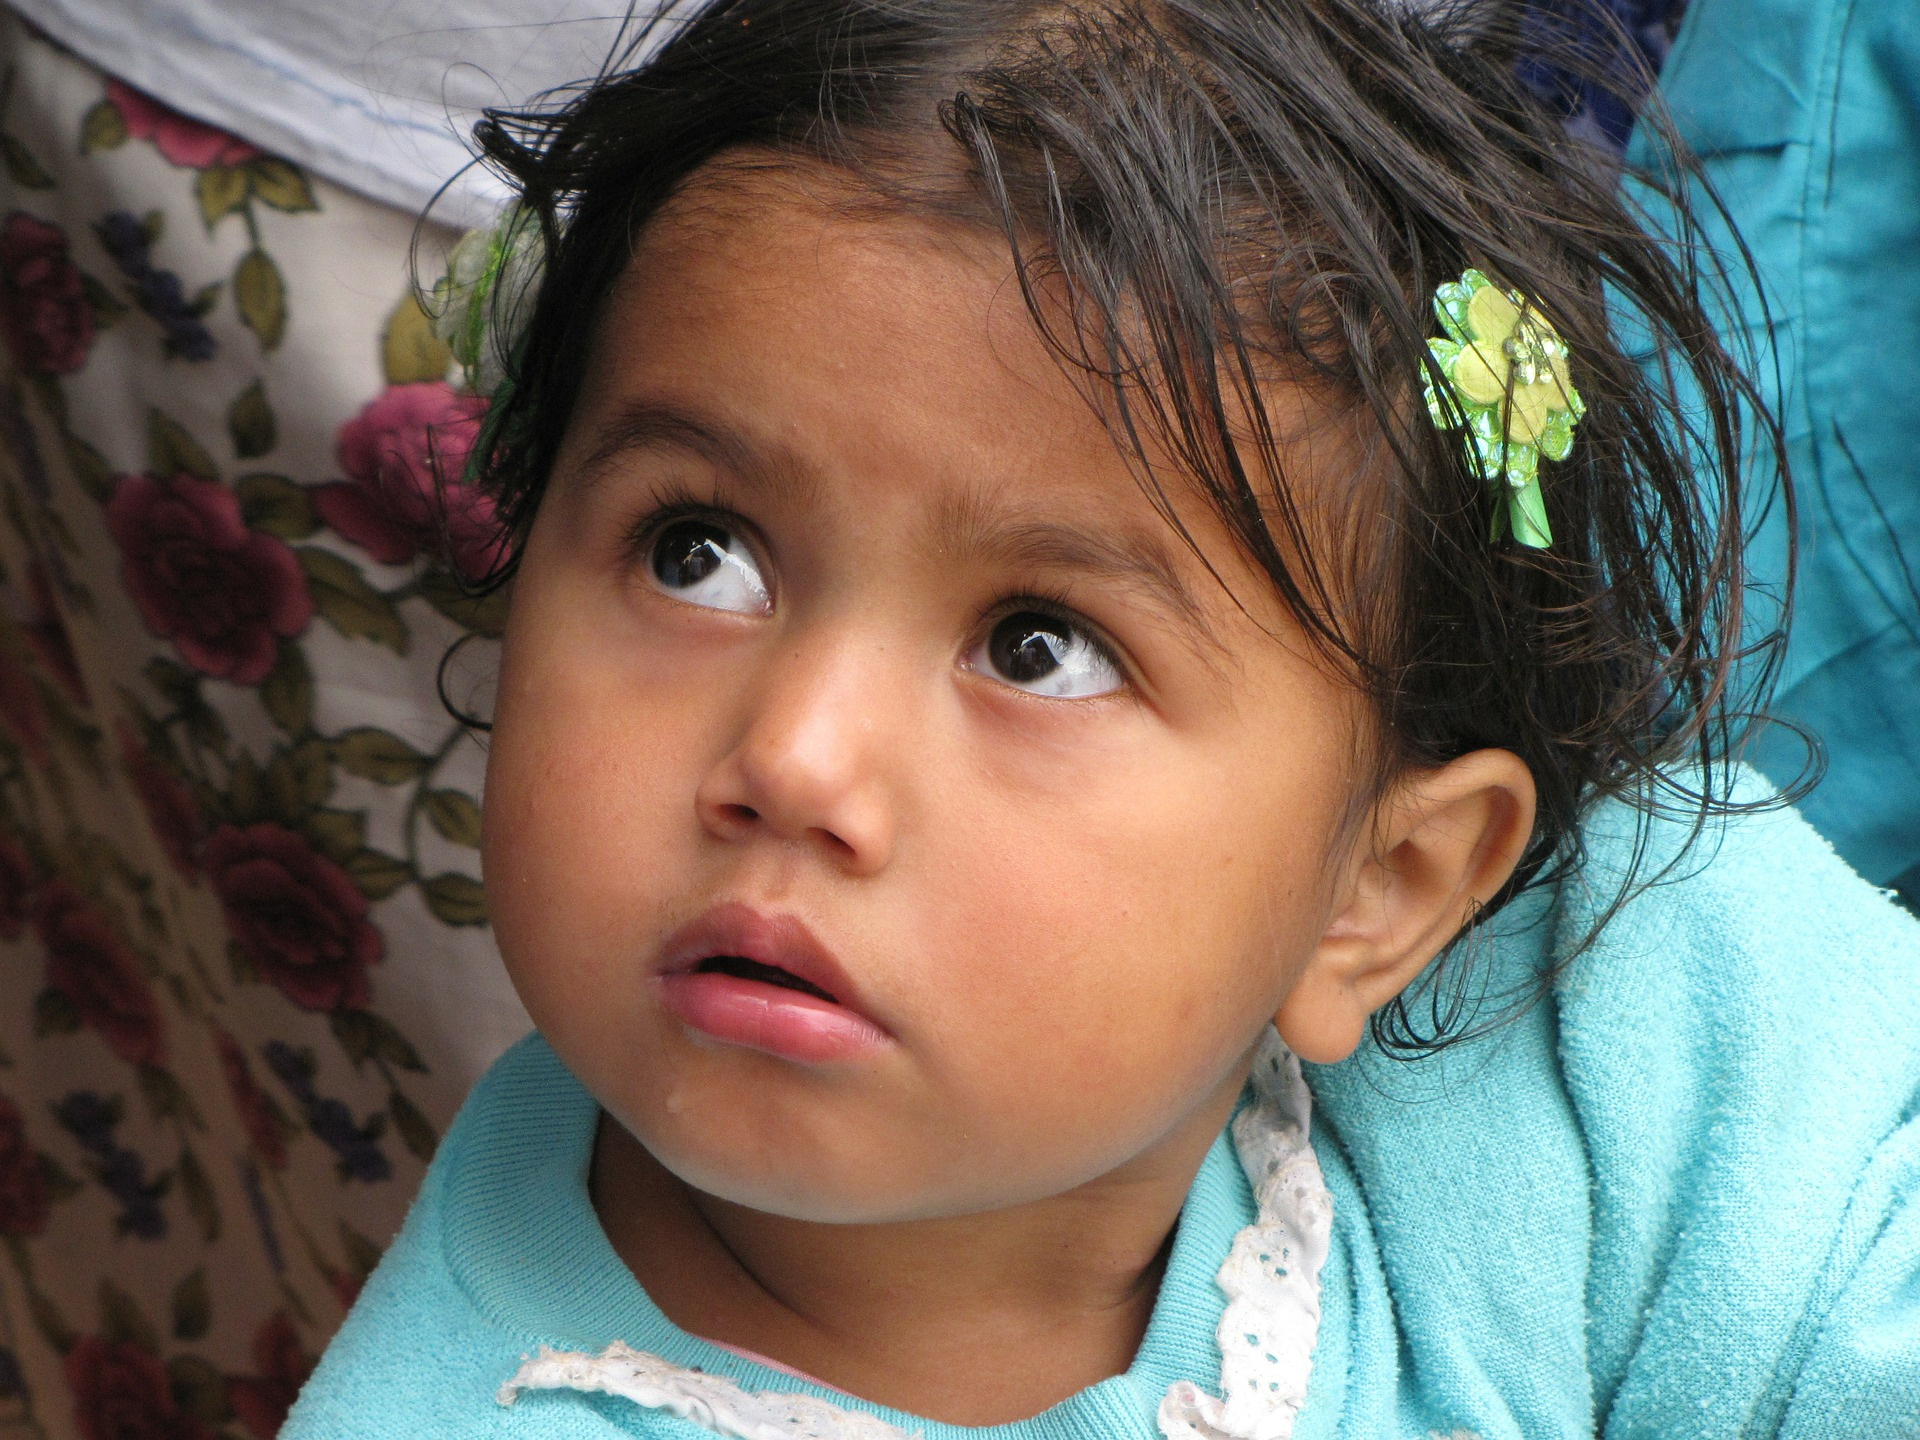 Poverty Fertility And Health Among Hispanics In America S